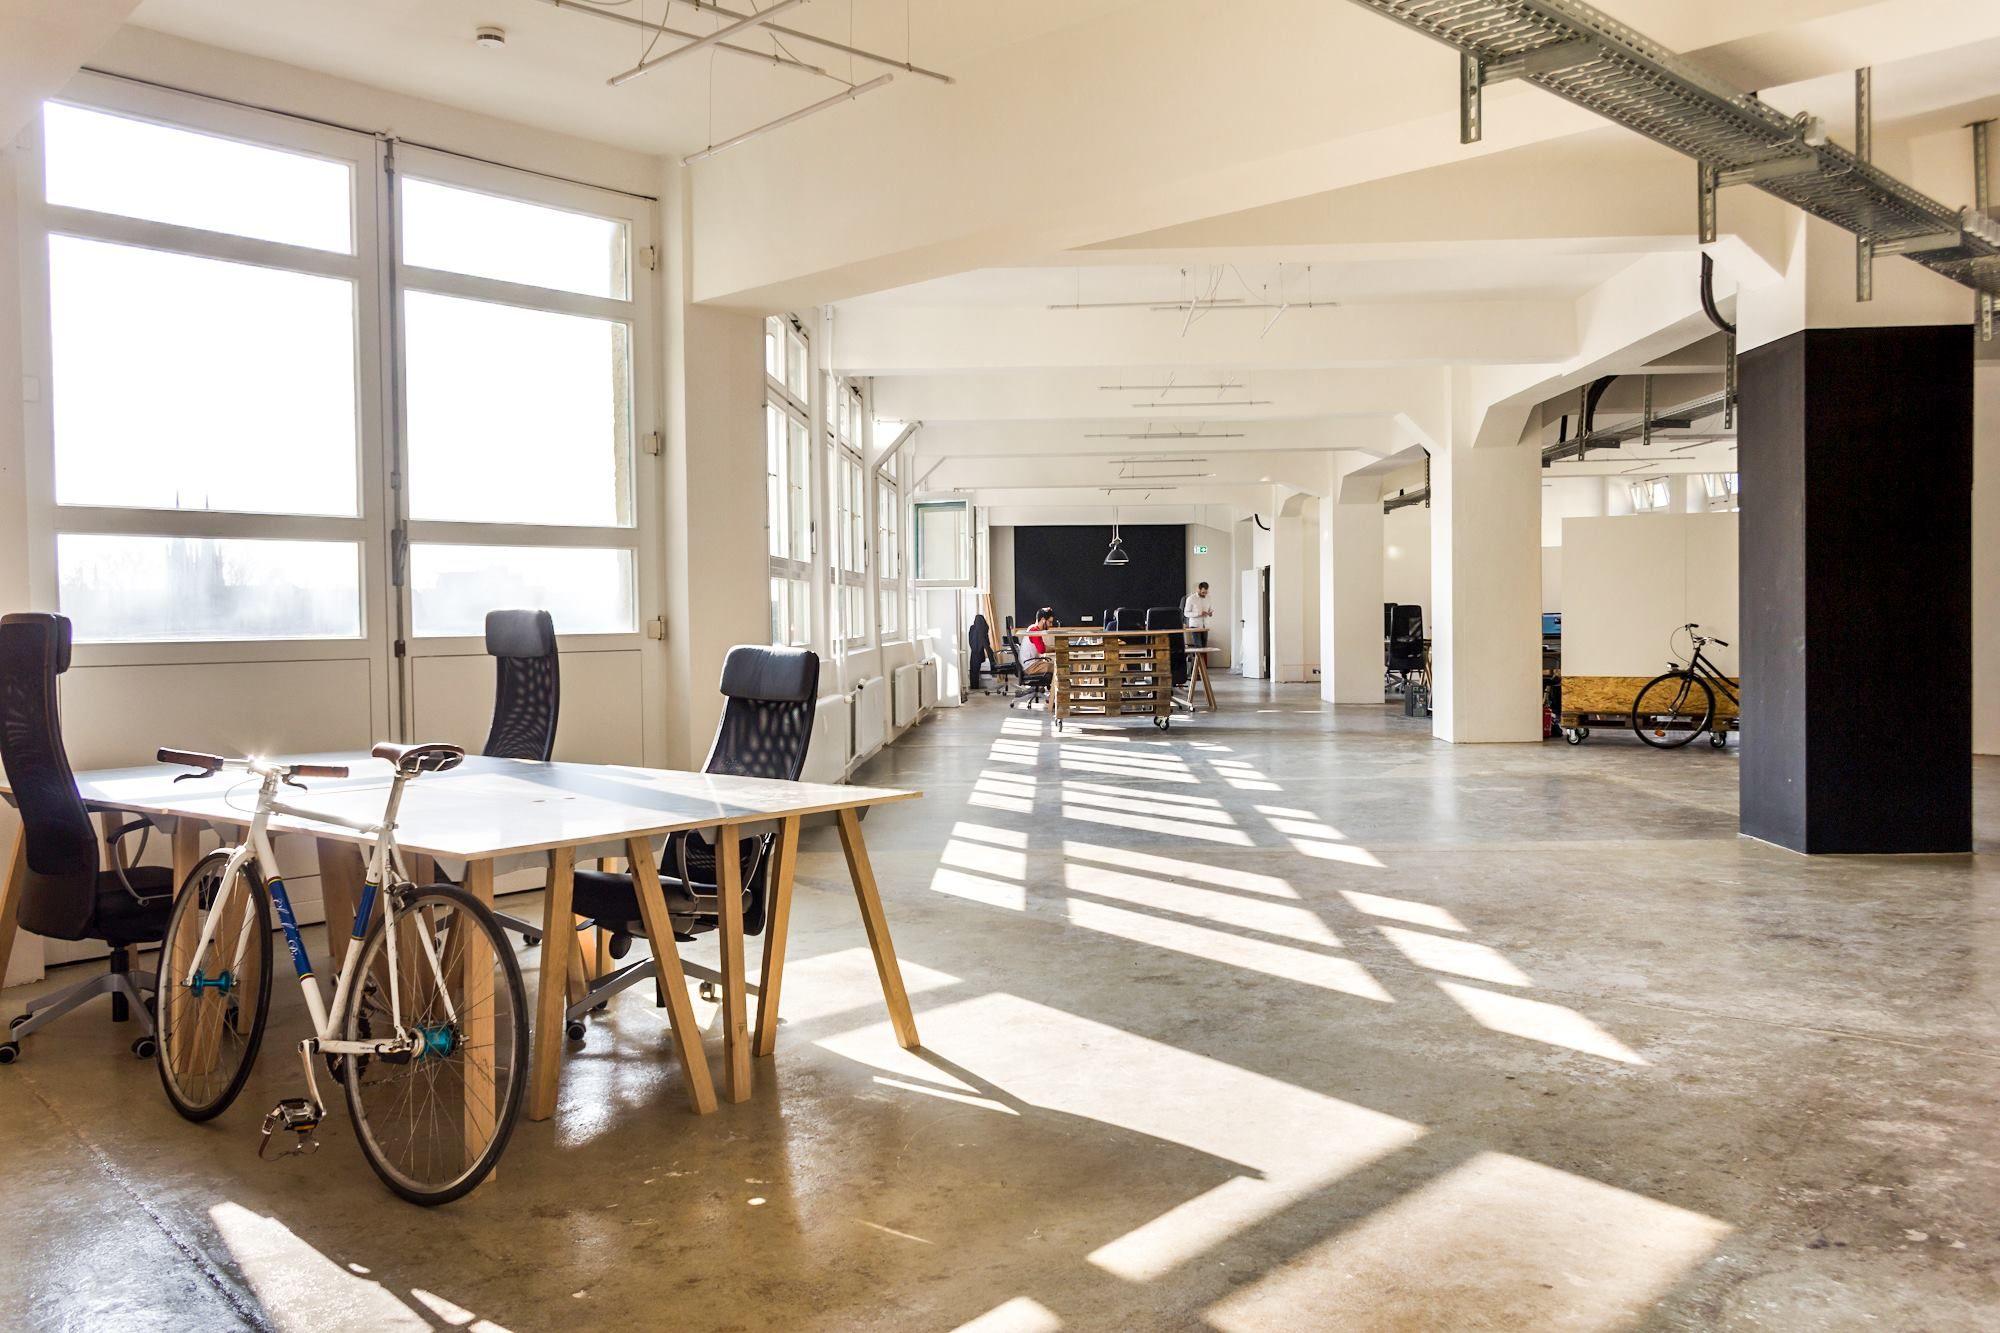 loft office. Office Lofts. Loft Lofts A